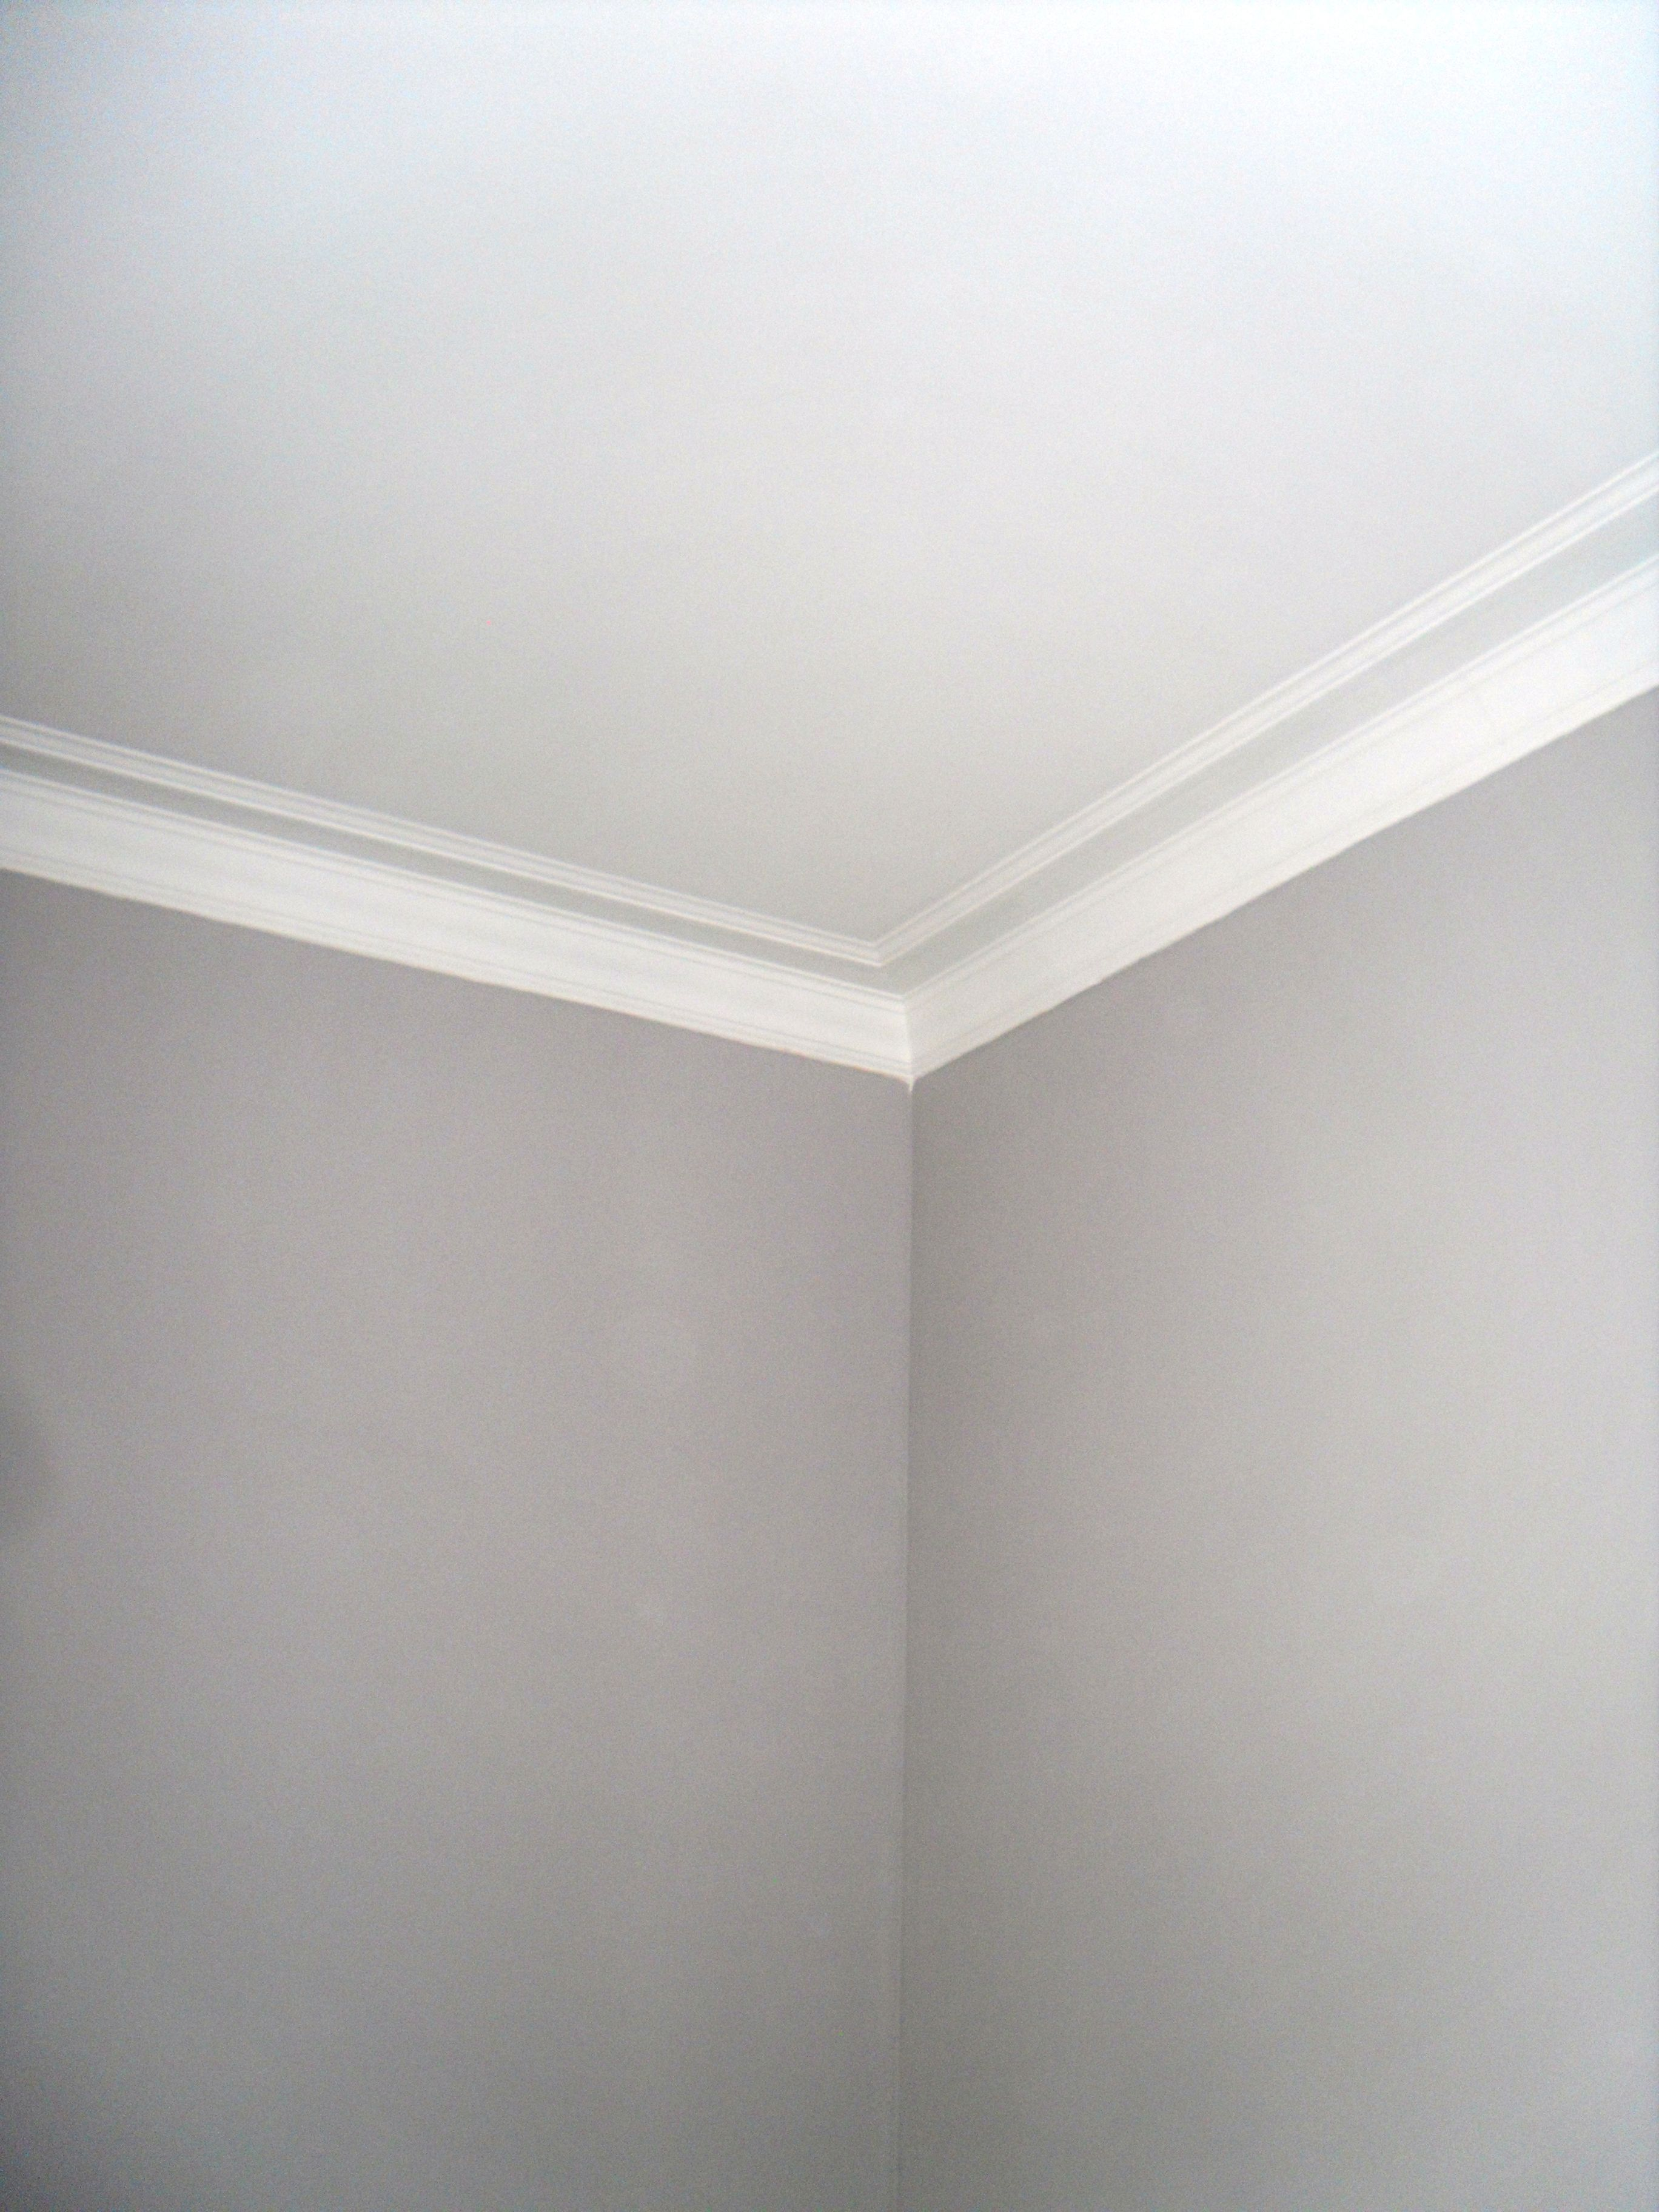 Master Bedroom And Bathroom Color Schemes